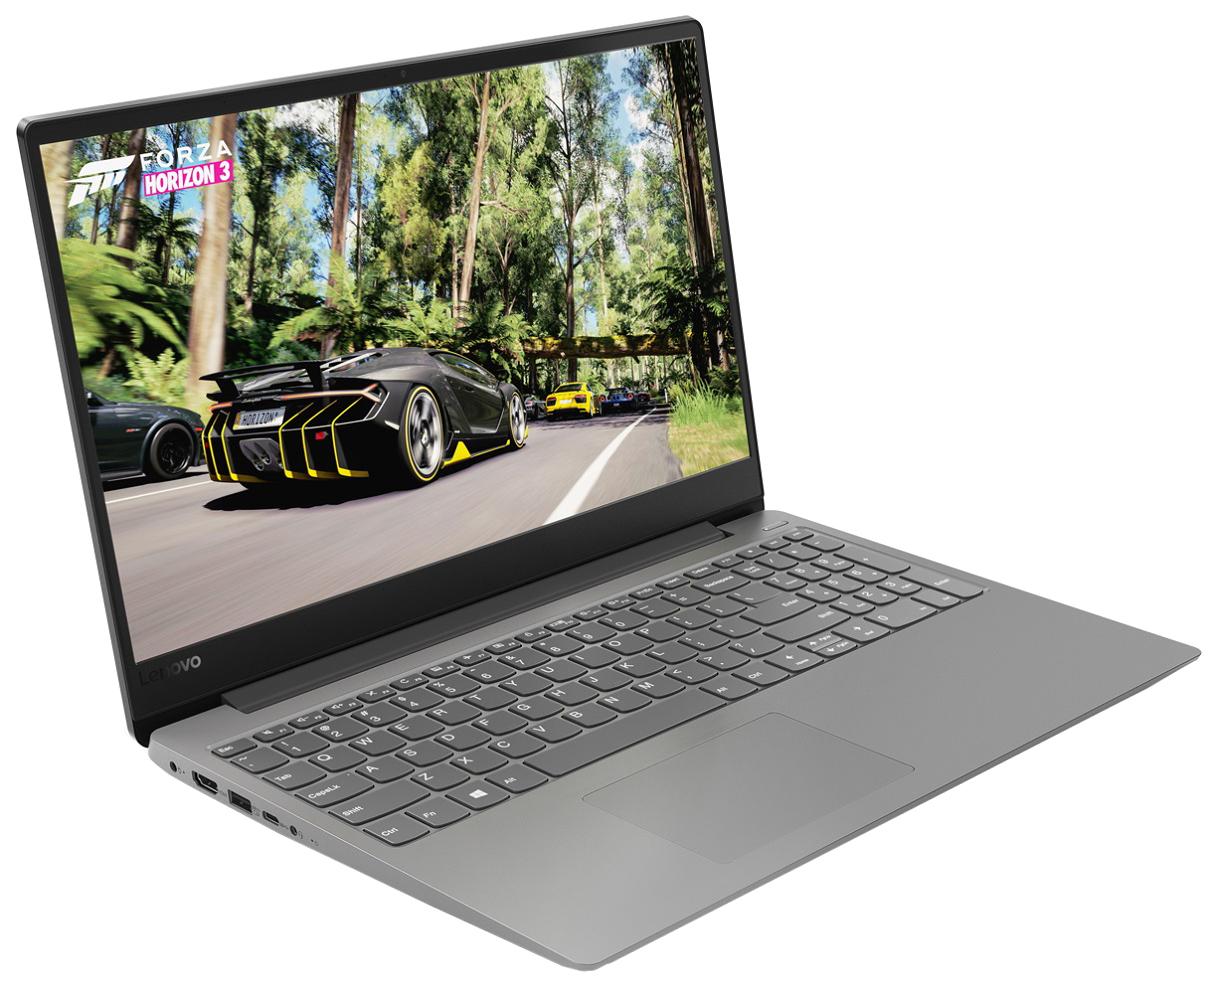 Ноутбук Lenovo Ideapad 300 330S-15IKB 81F500URRU